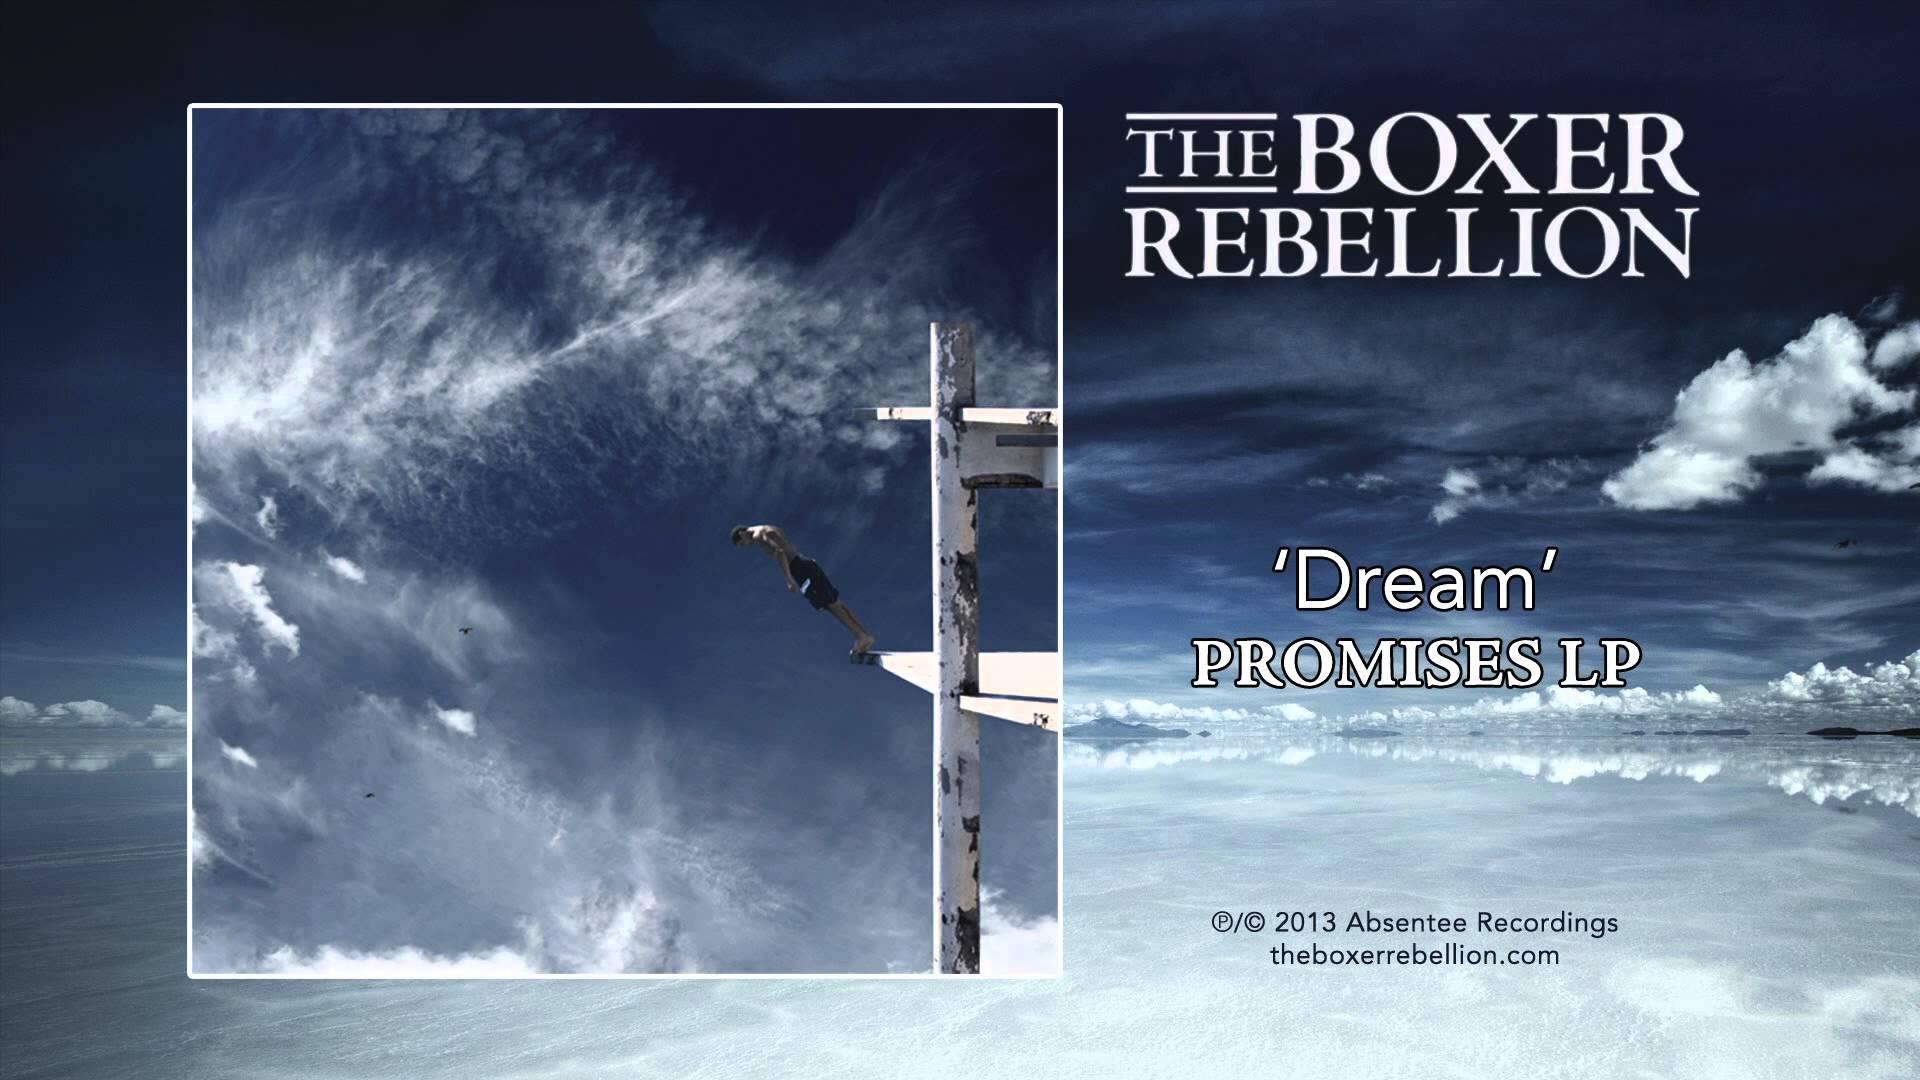 The Boxer Rebellion Pics, Music Collection